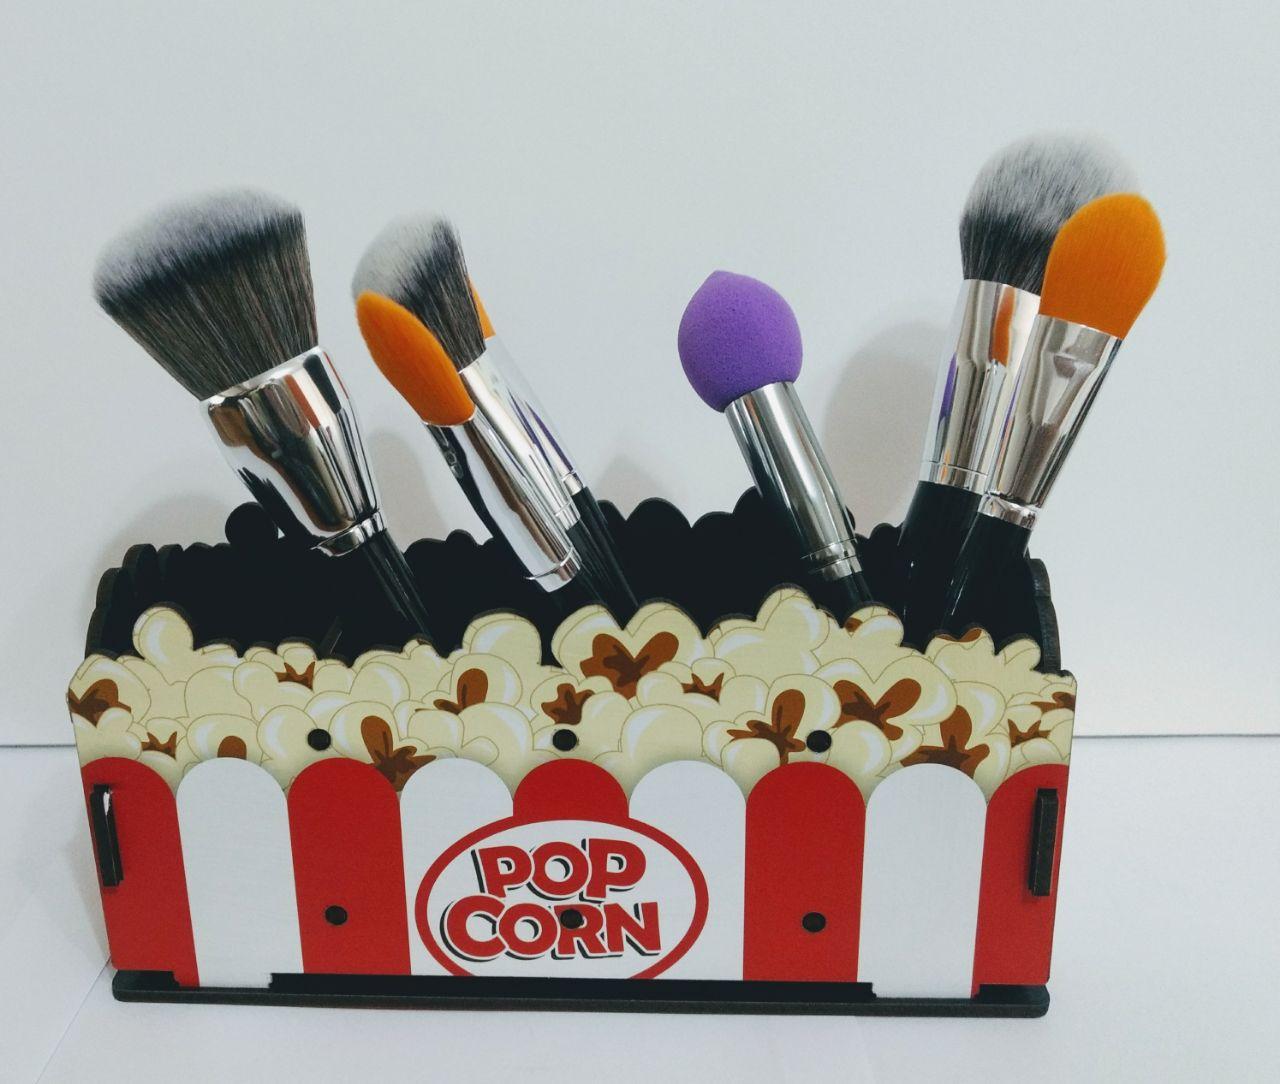 Organizador porta objetos Pincel Pop Corn MDF